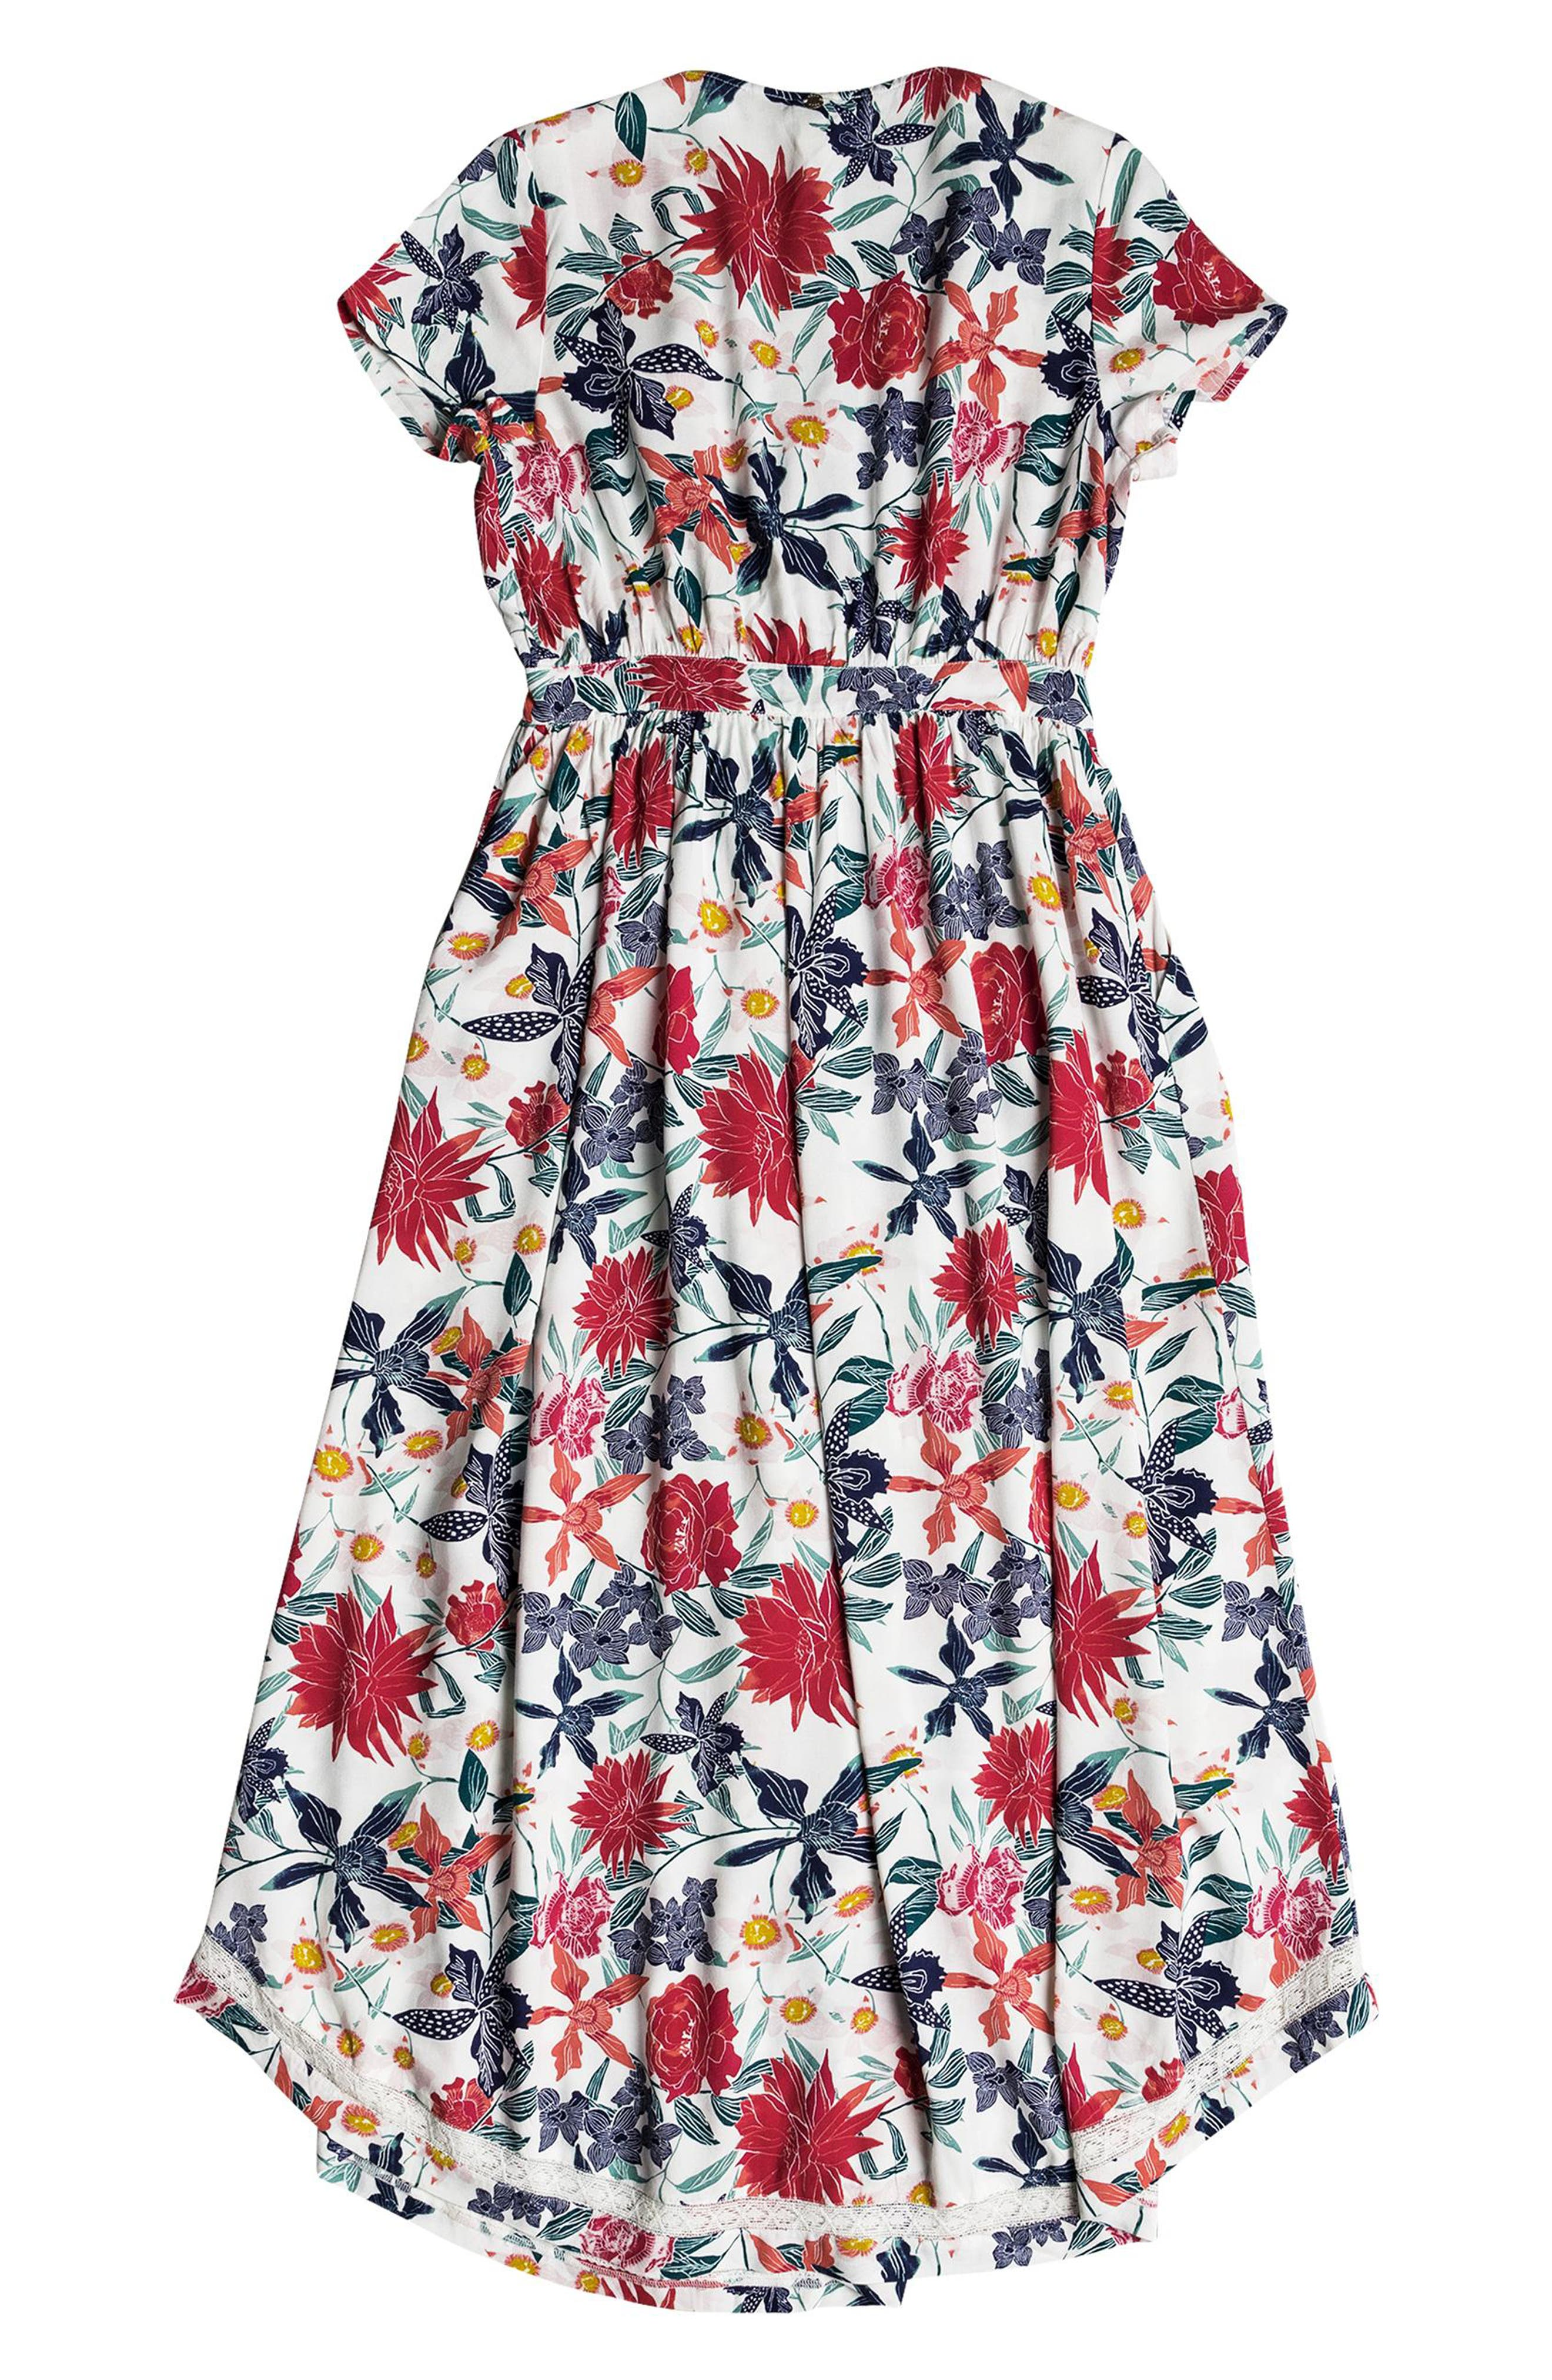 District Nights Floral Print Dress,                             Alternate thumbnail 9, color,                             100